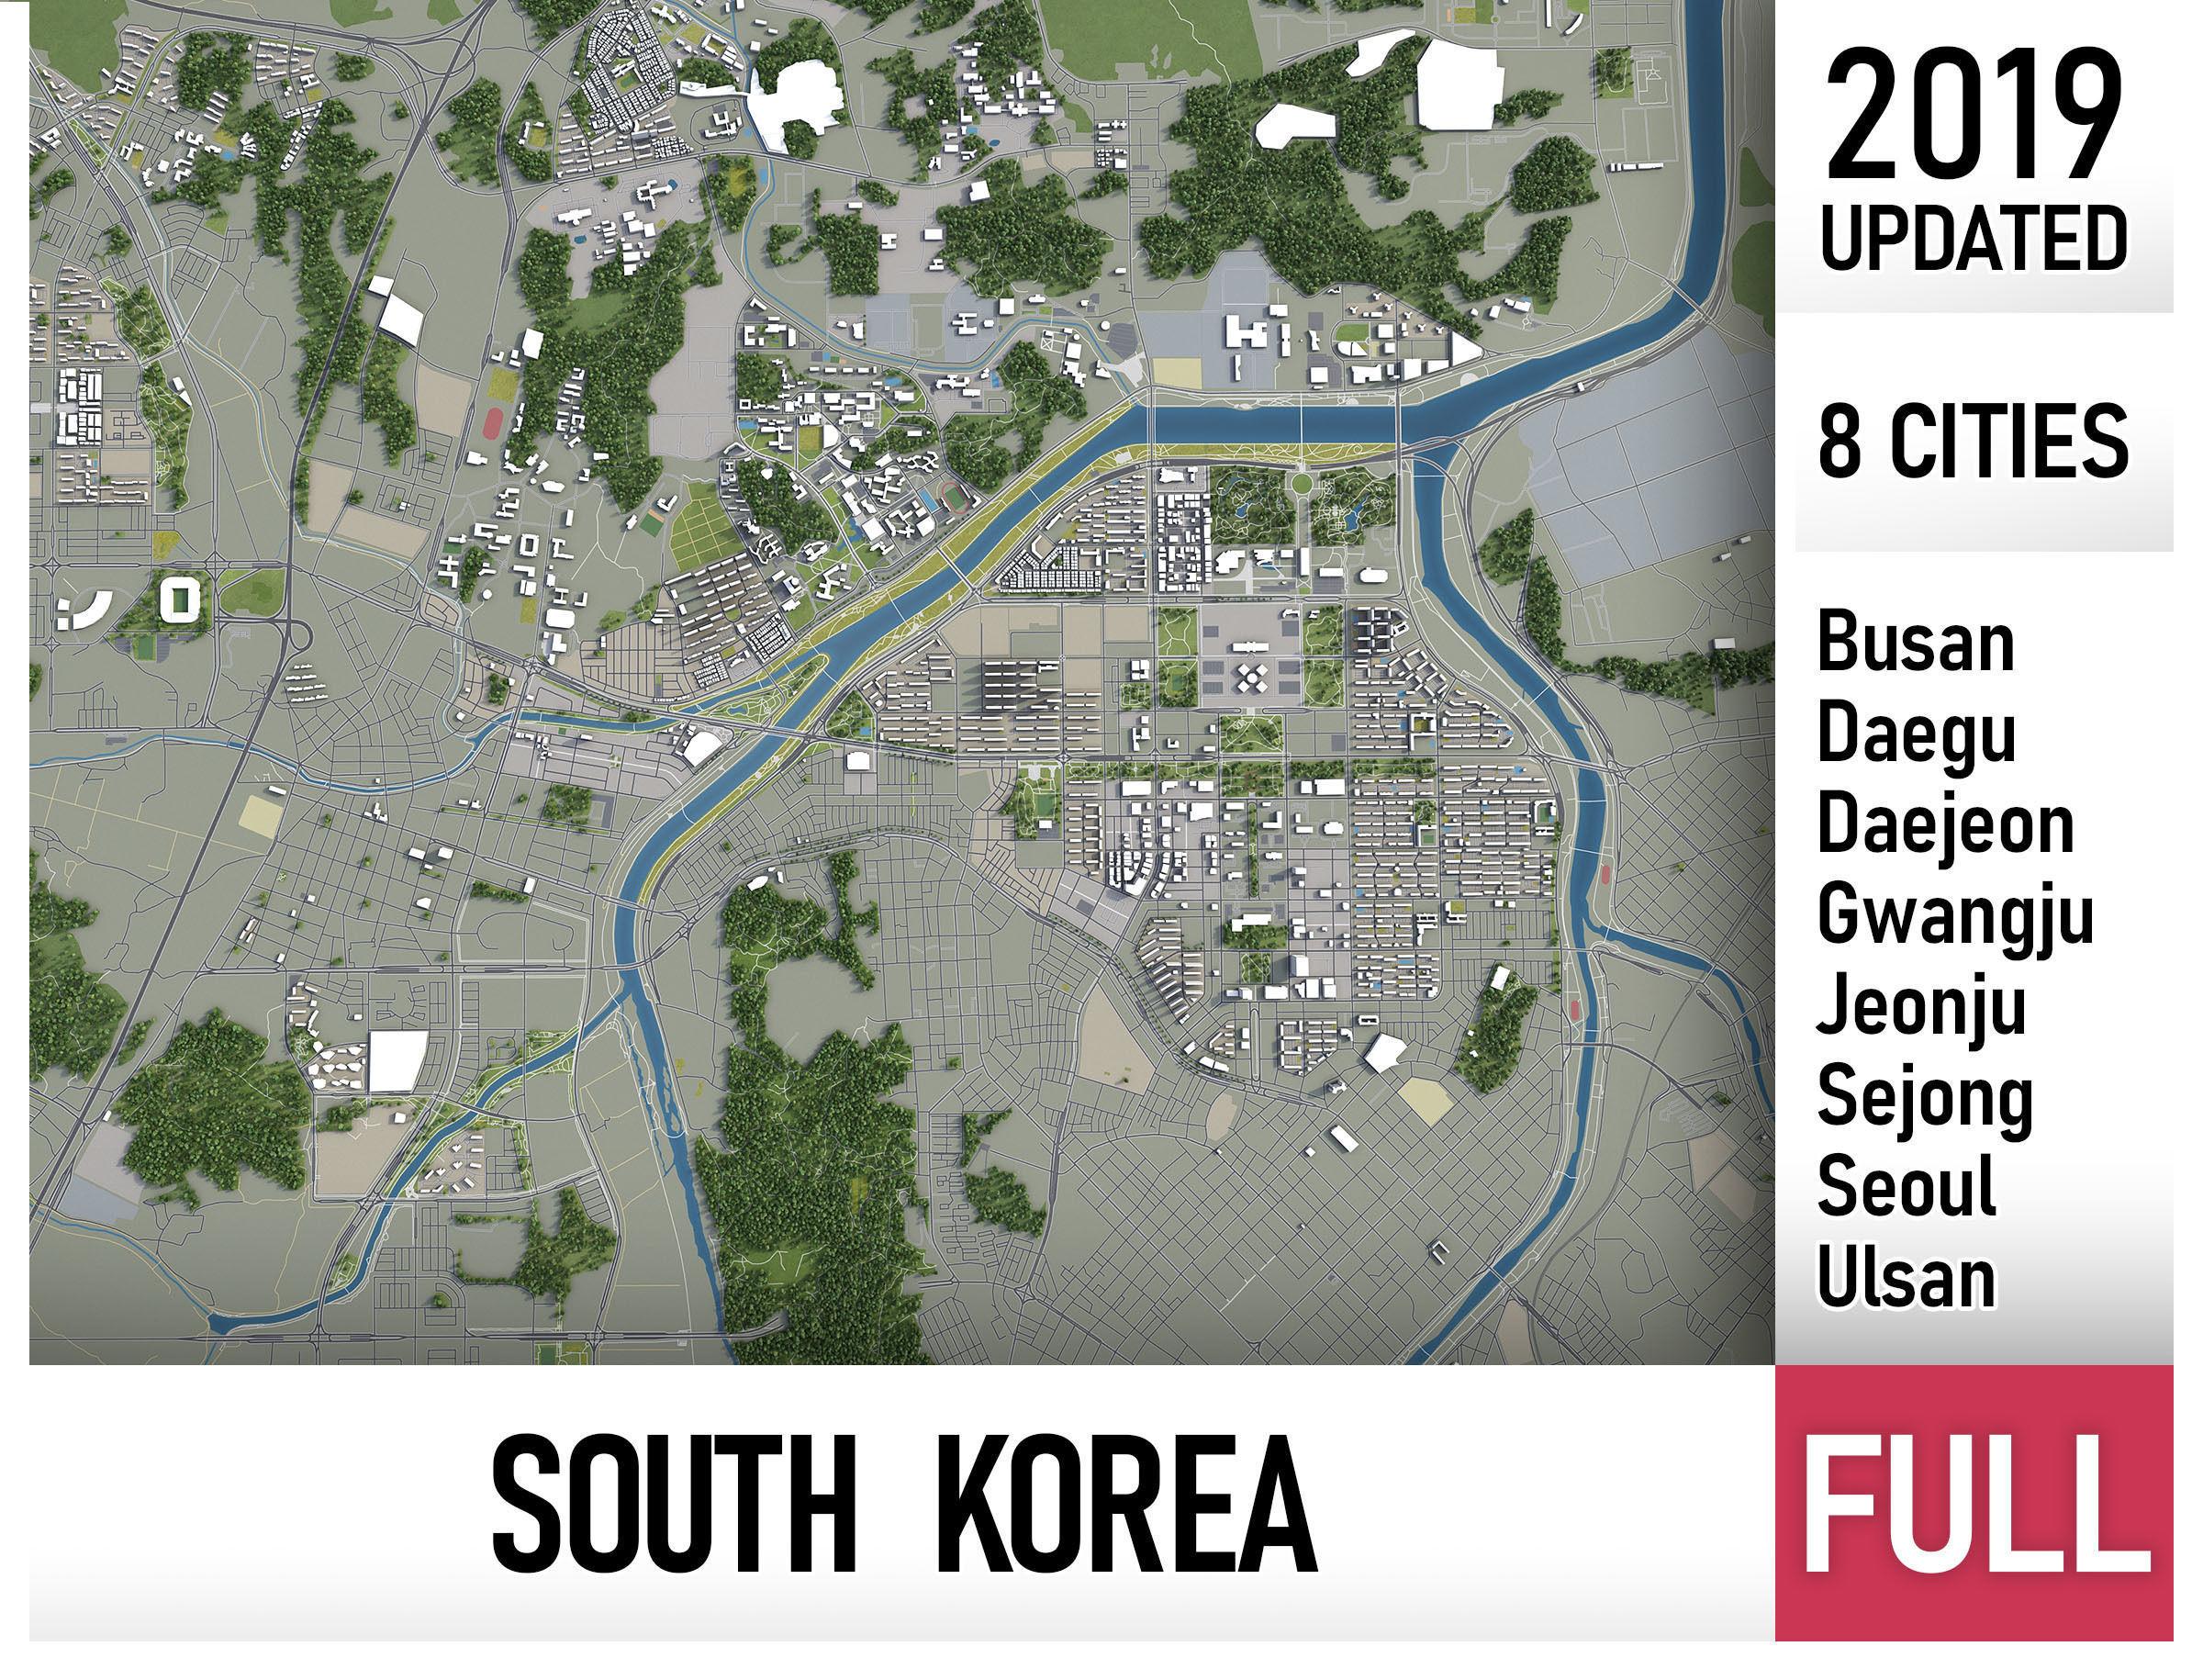 South Korea - all cities